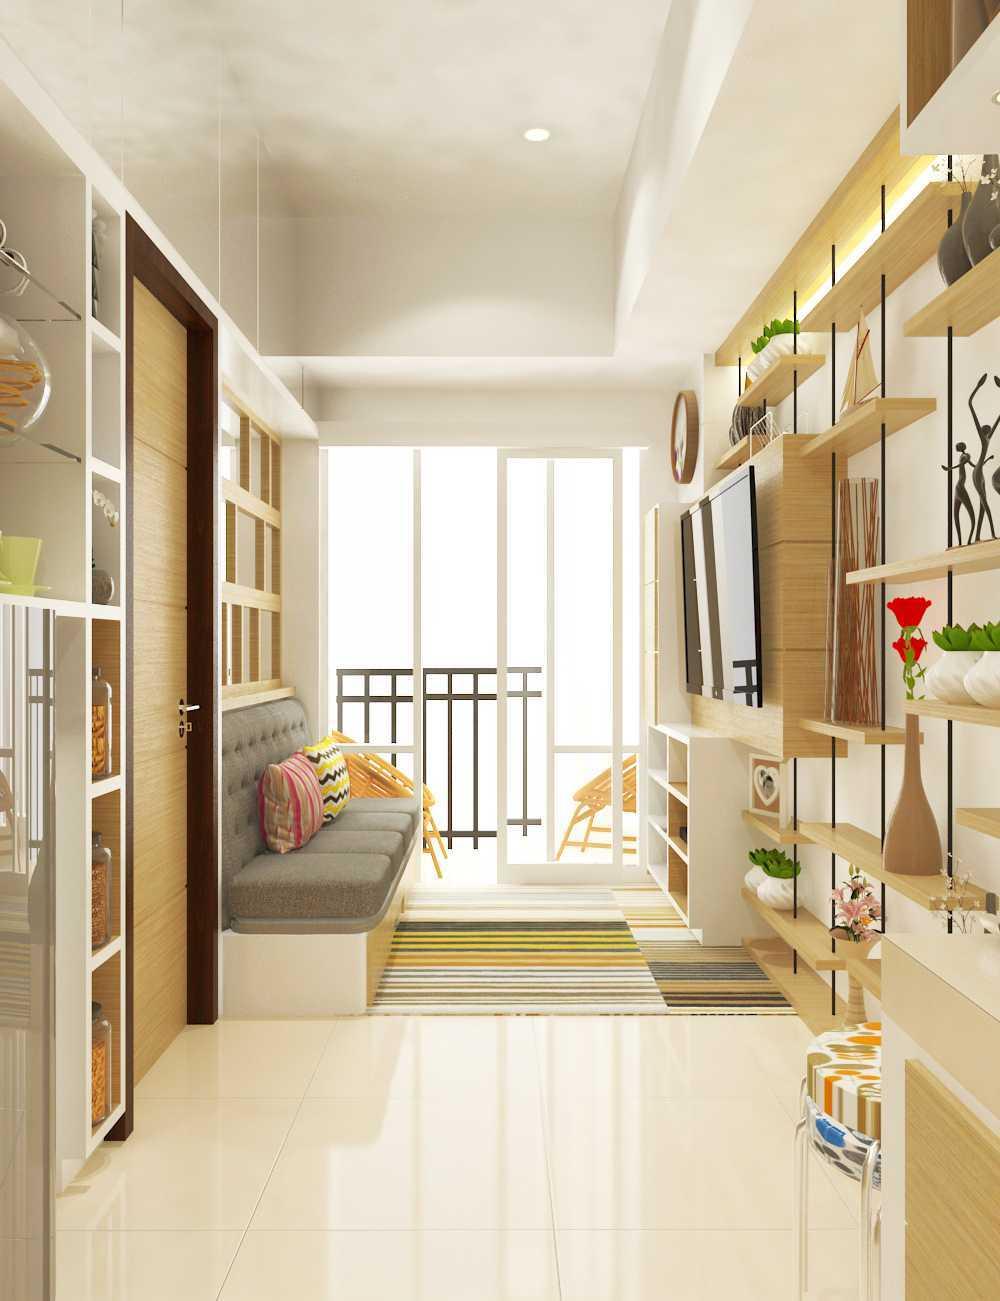 Interior design of apartment unit karya MIV Architects (Muhammad Ikhsan Hamiru & Partners) (Sumber: arsitag.com)